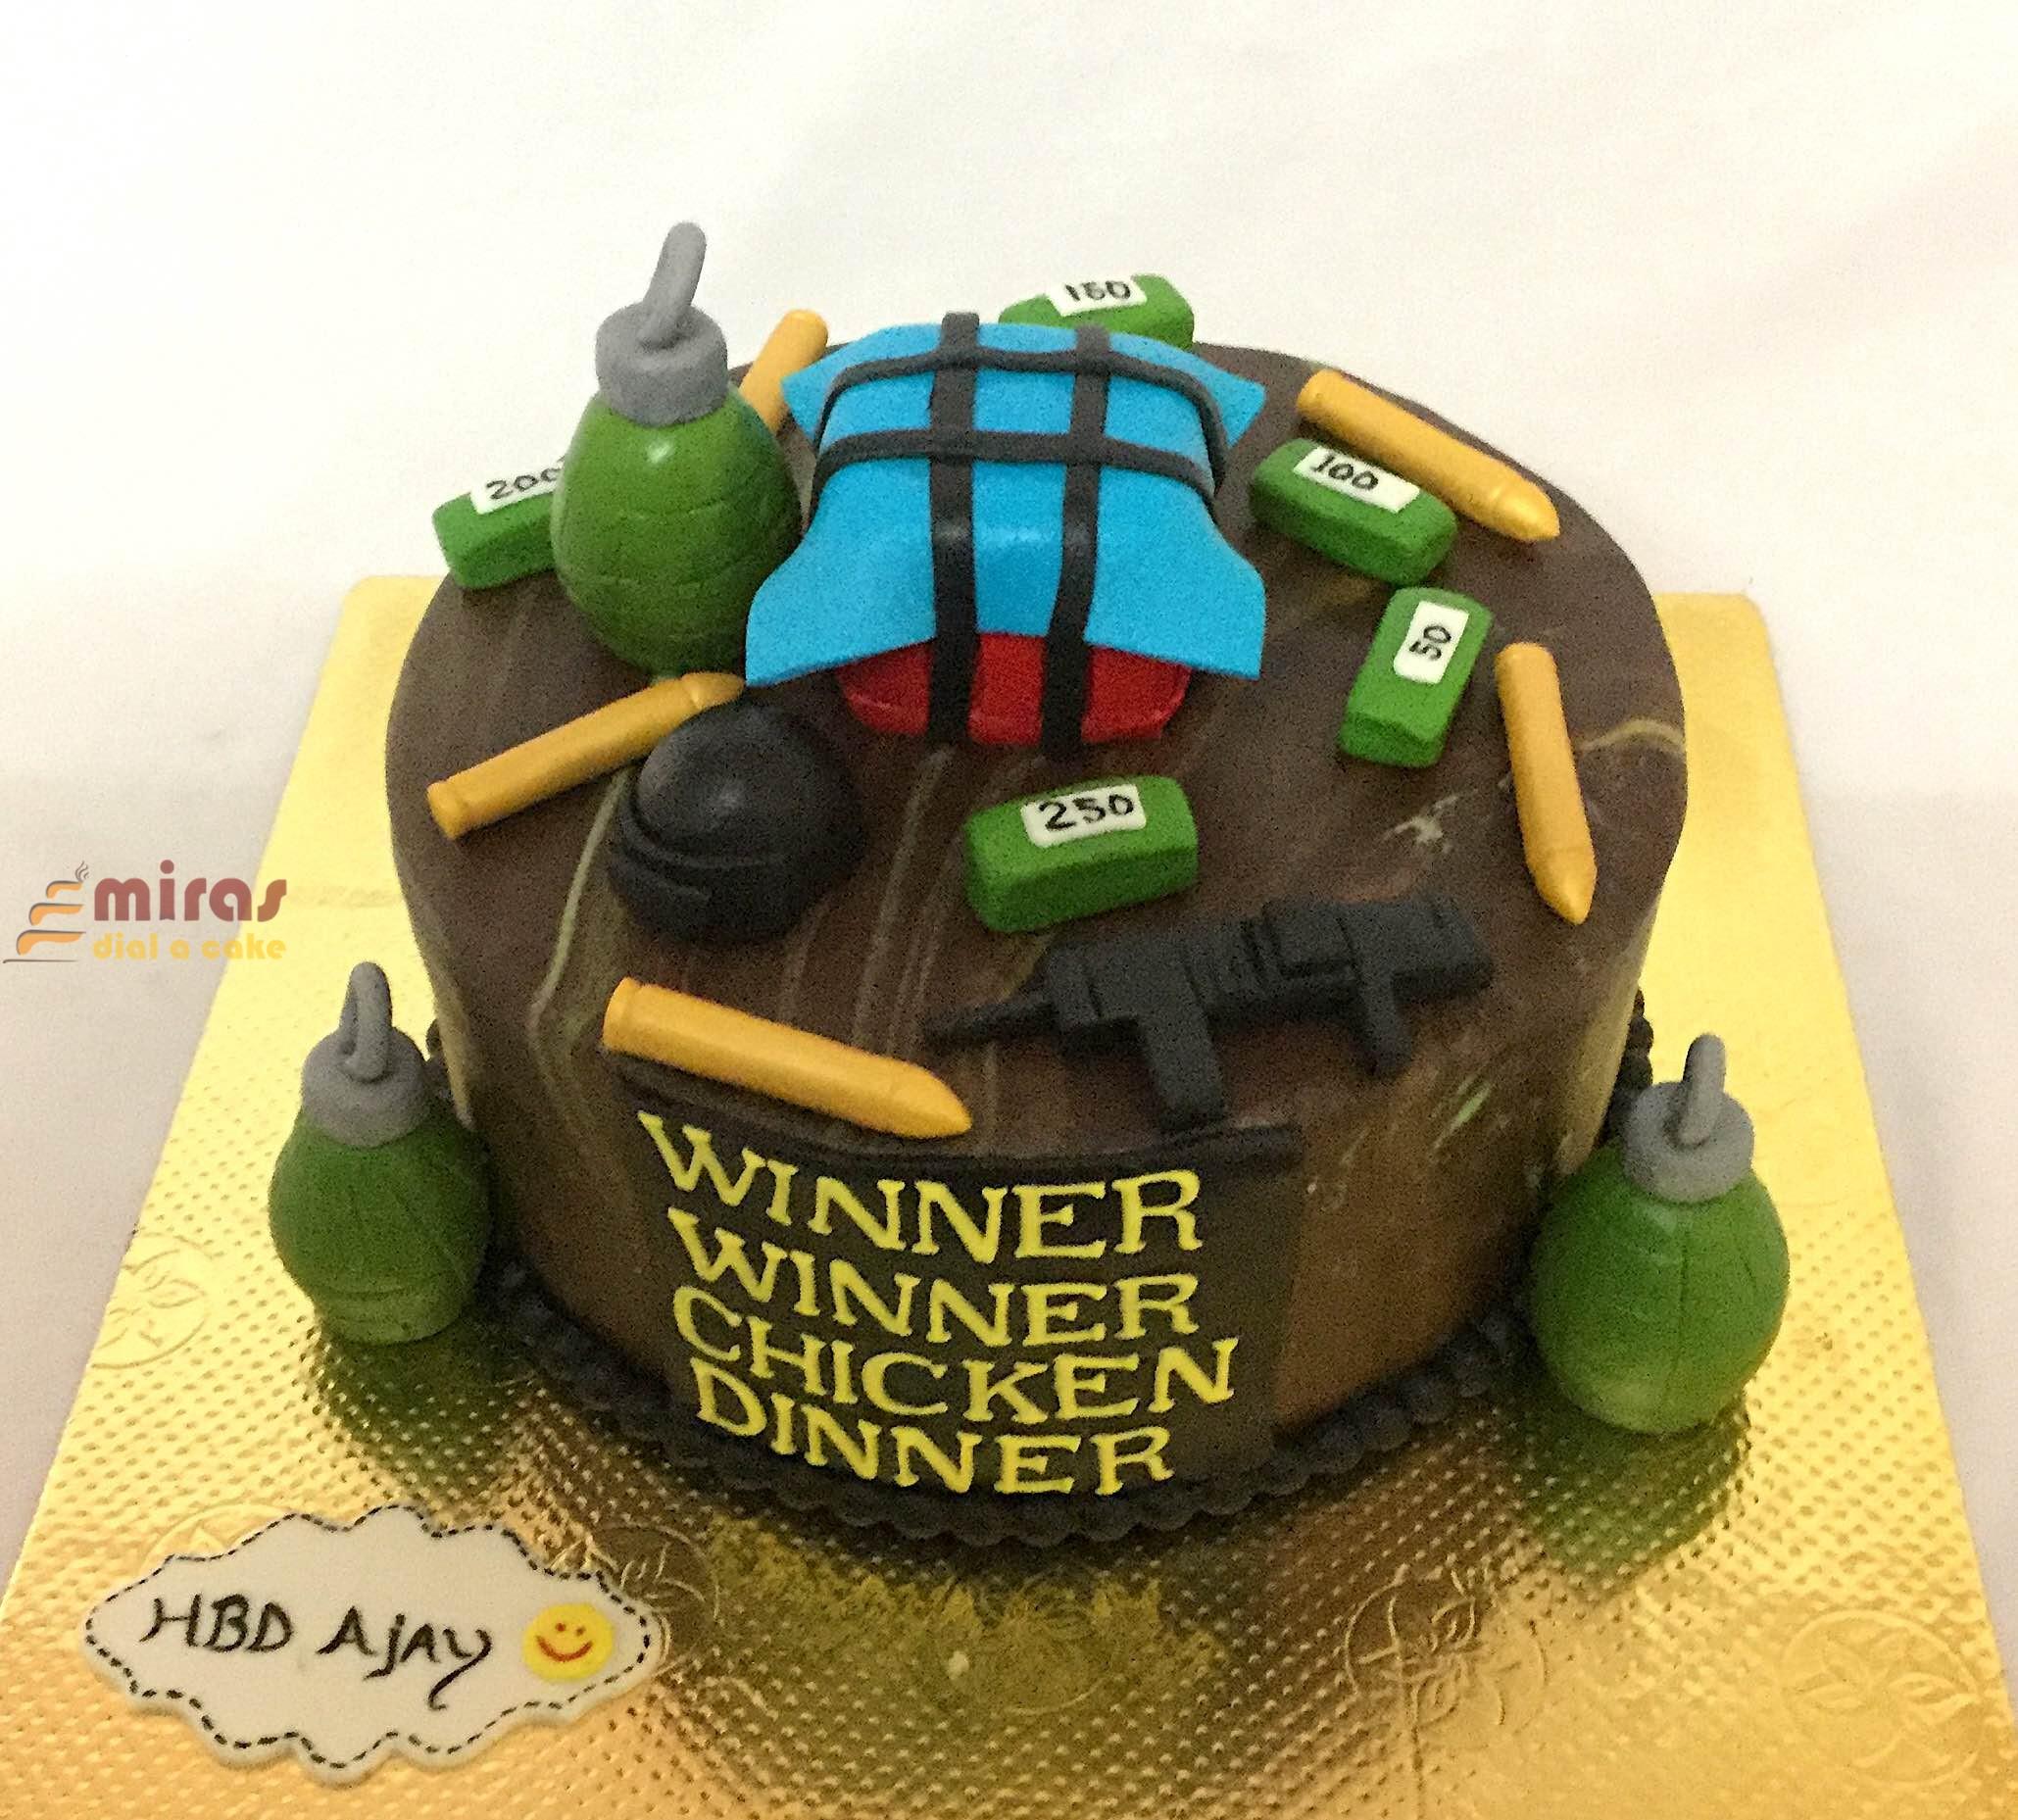 Strange Pubg Theme Birthday Cake Order Online Pubg Customized Cakes For Funny Birthday Cards Online Bapapcheapnameinfo